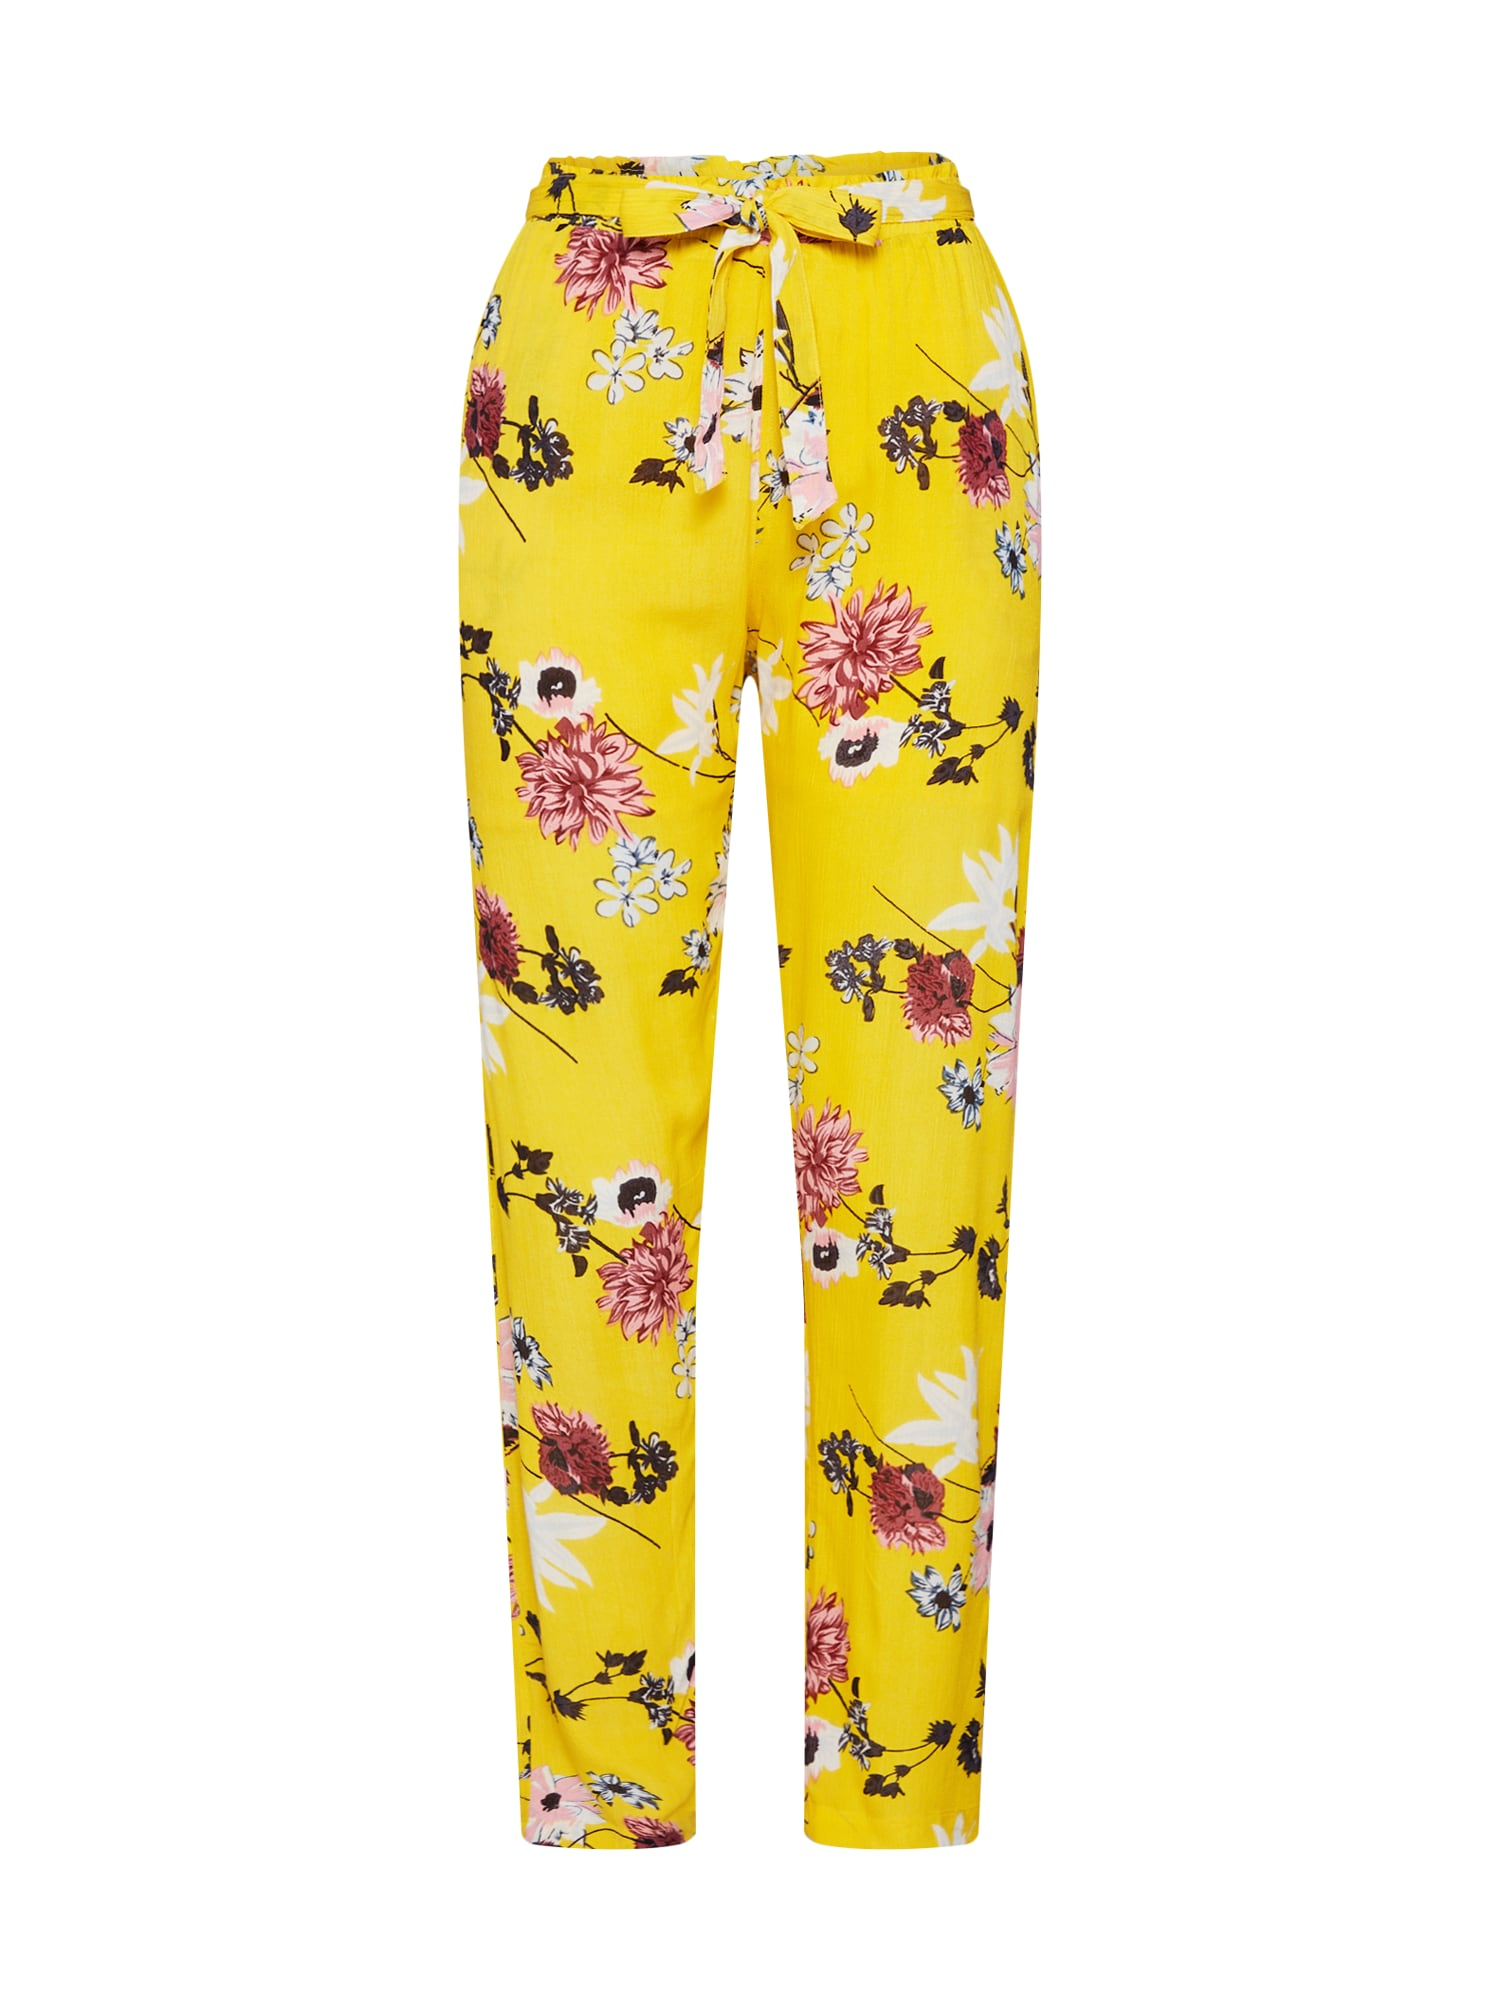 Kalhoty Addi 6 žlutá mix barev Desires